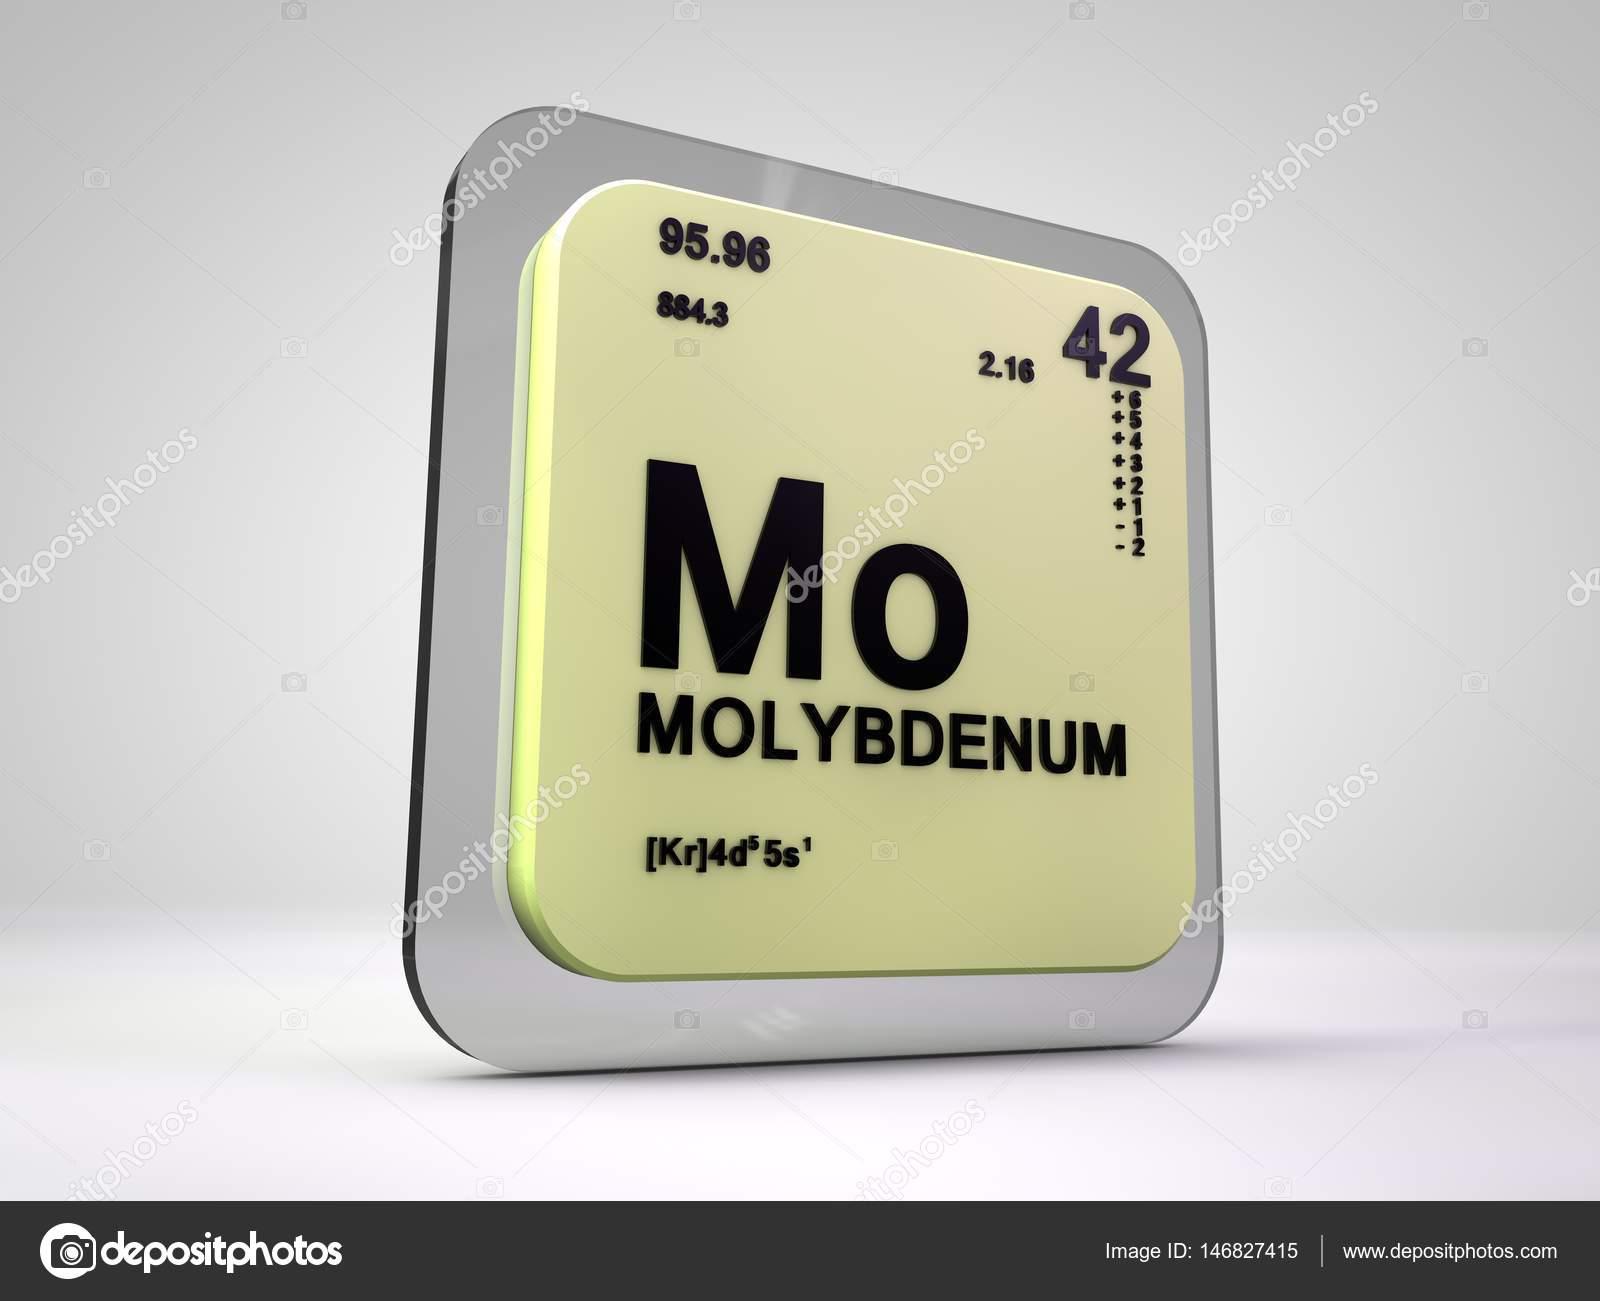 Molybdenum mo chemical element periodic table 3d render molybdenum mo chemical element periodic table 3d render stock photo urtaz Choice Image